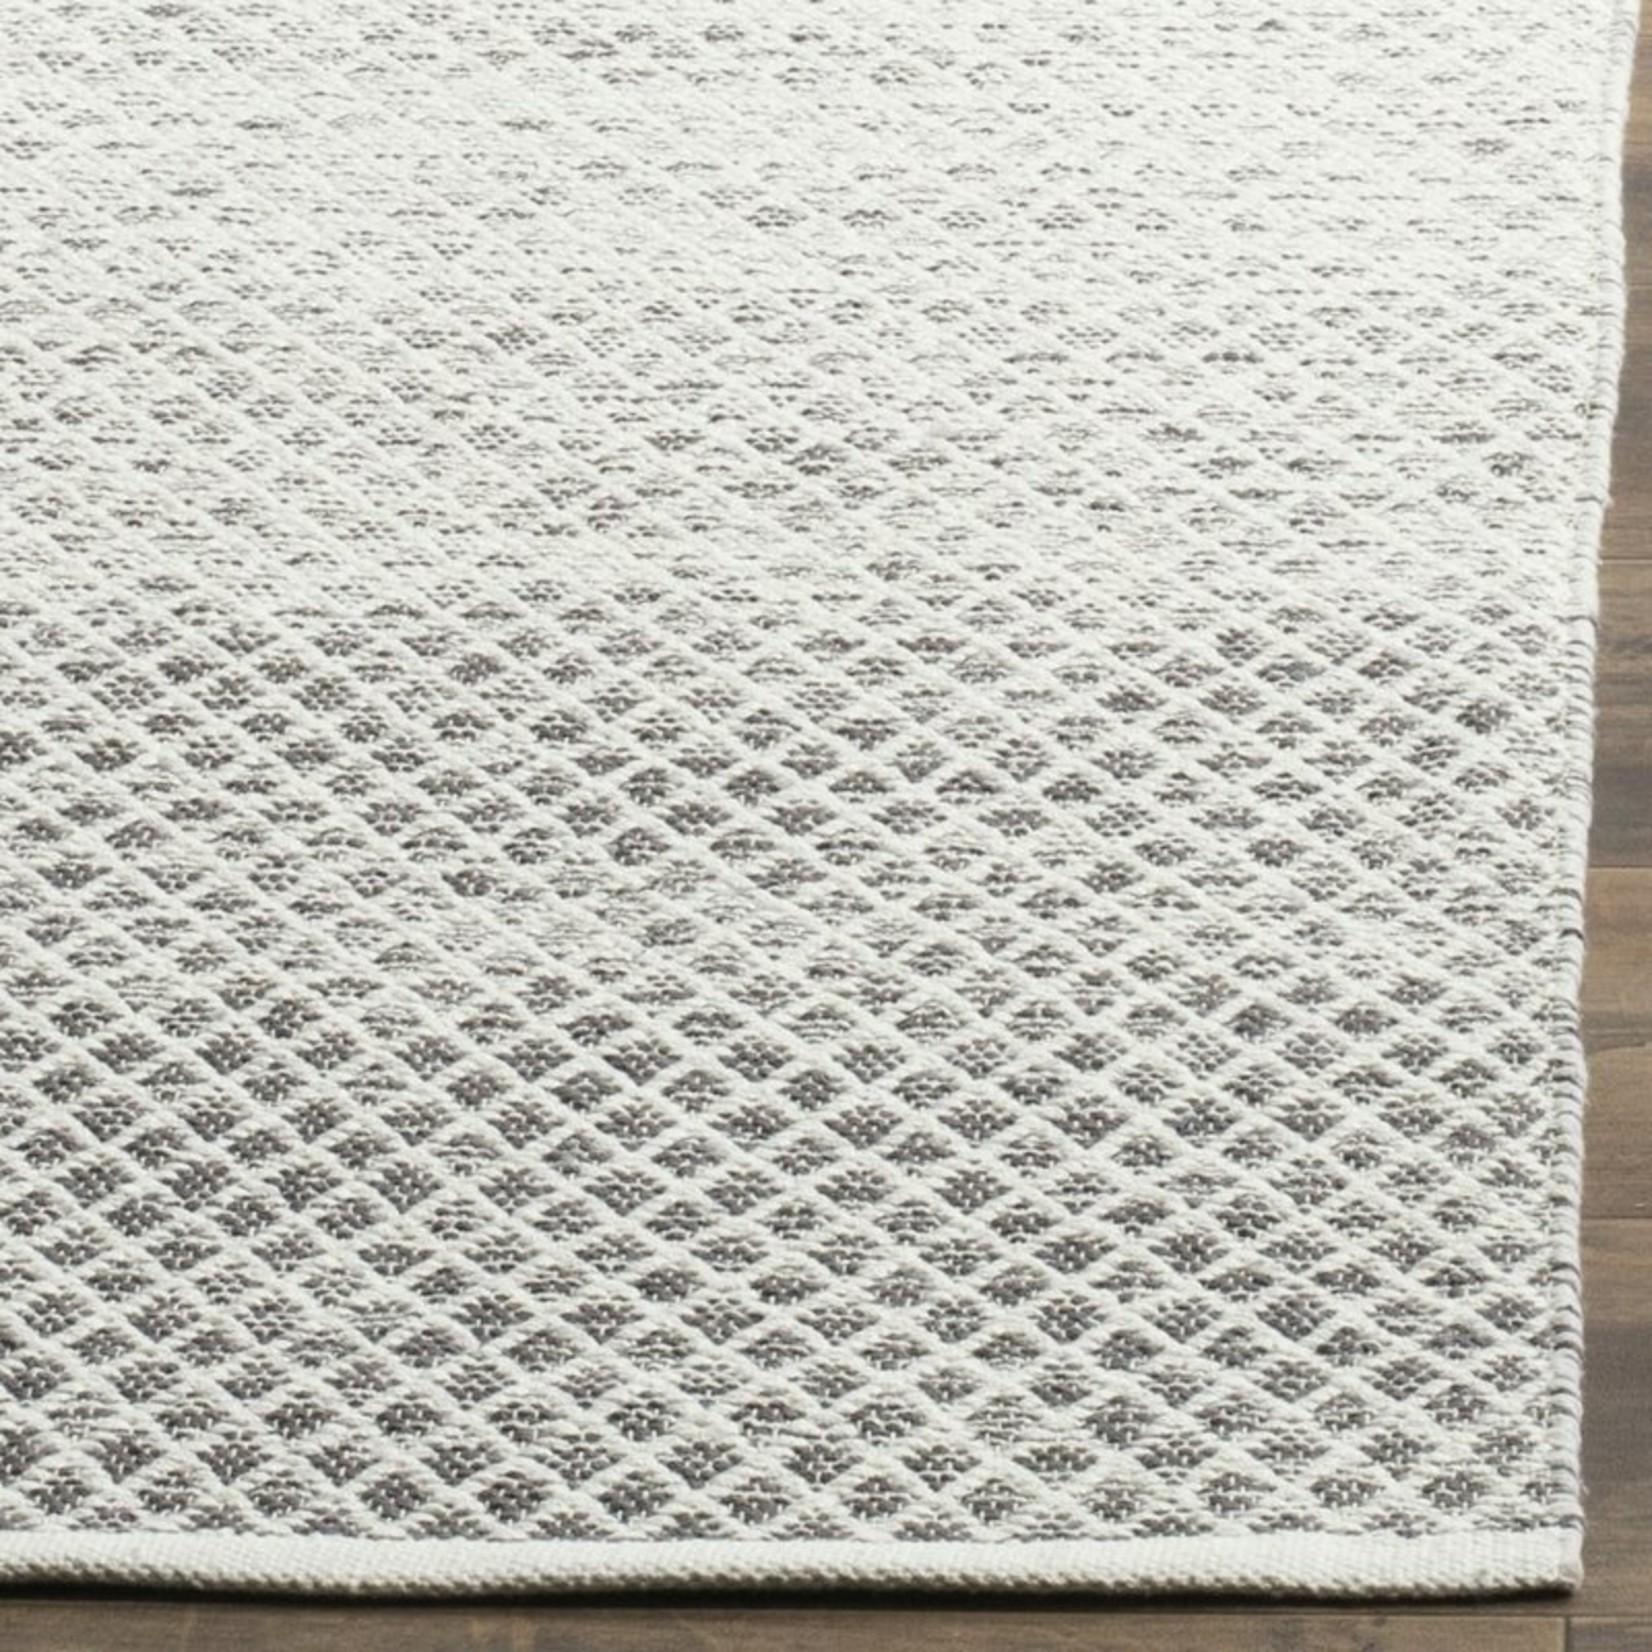 *3' x 5' - Amaya Geometric Hand-Woven Flatweave Cotton Light Gray/Ivory Area Rug